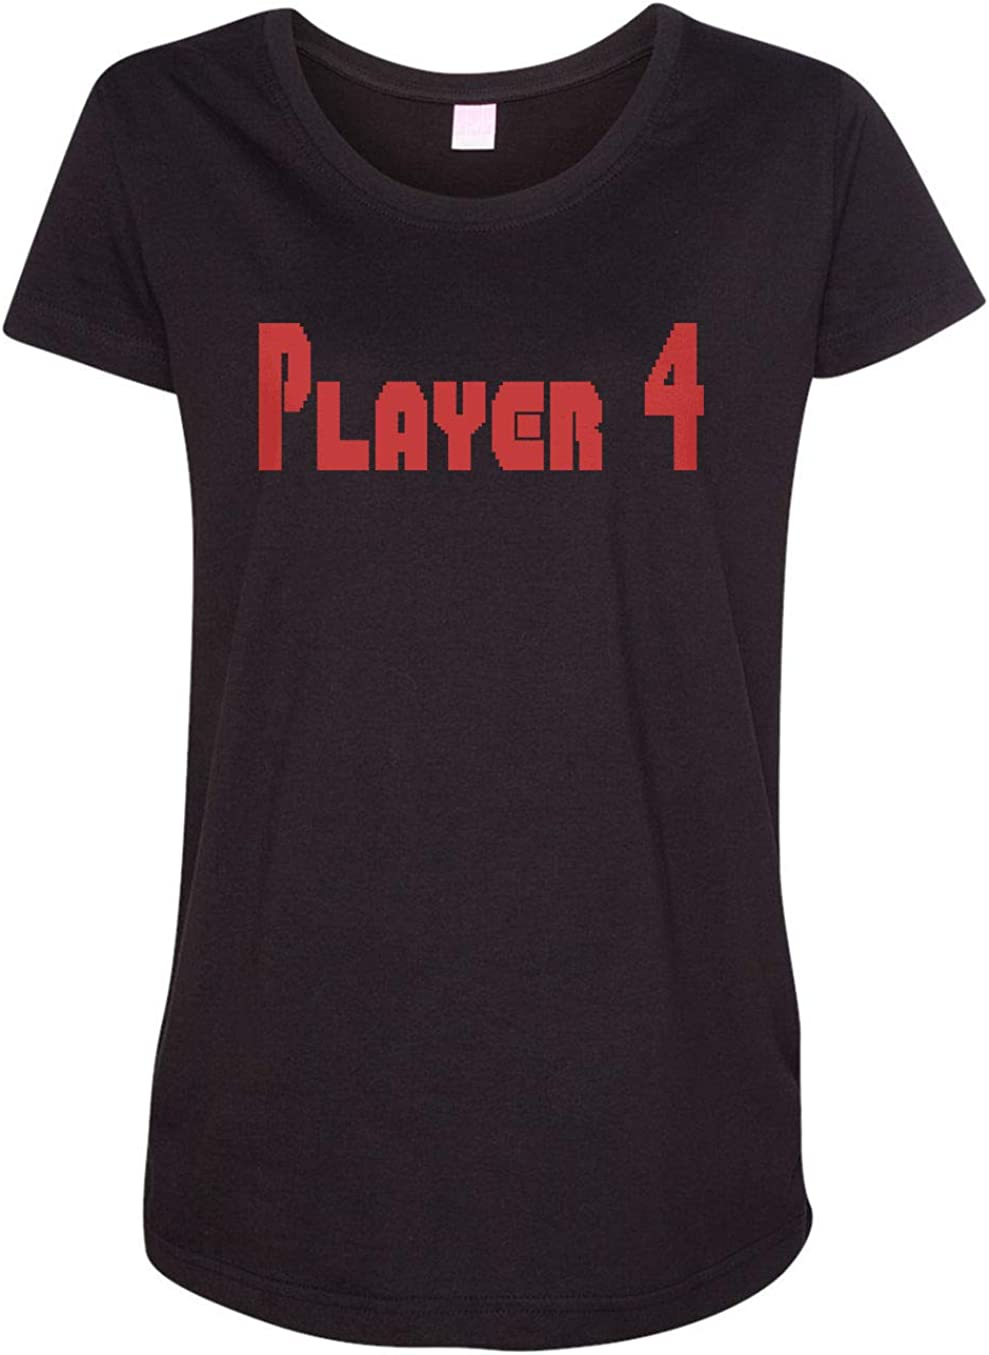 HARD EDGE DESIGN Women's Super Player 4 T-Shirt